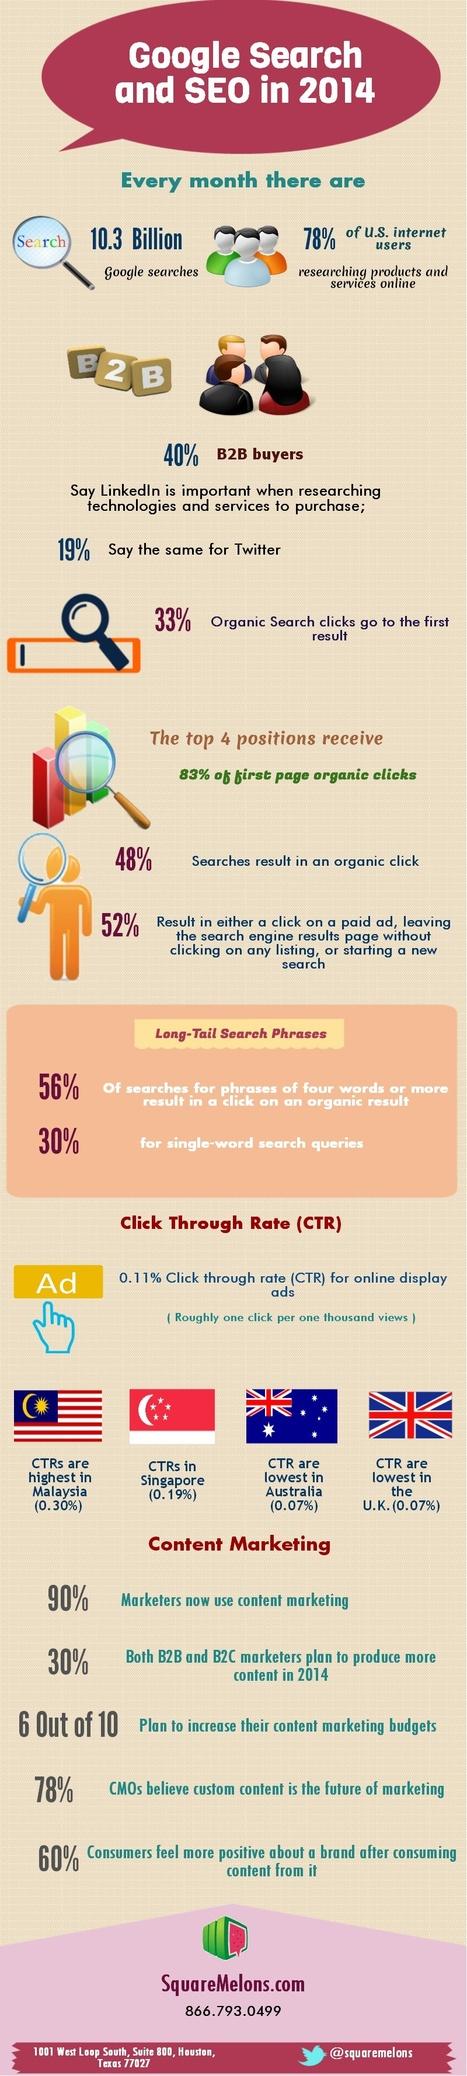 Google Search and SEO 2014 | Visual.ly | Web Design, Web Development , SEO, Mobile App Topics | Scoop.it